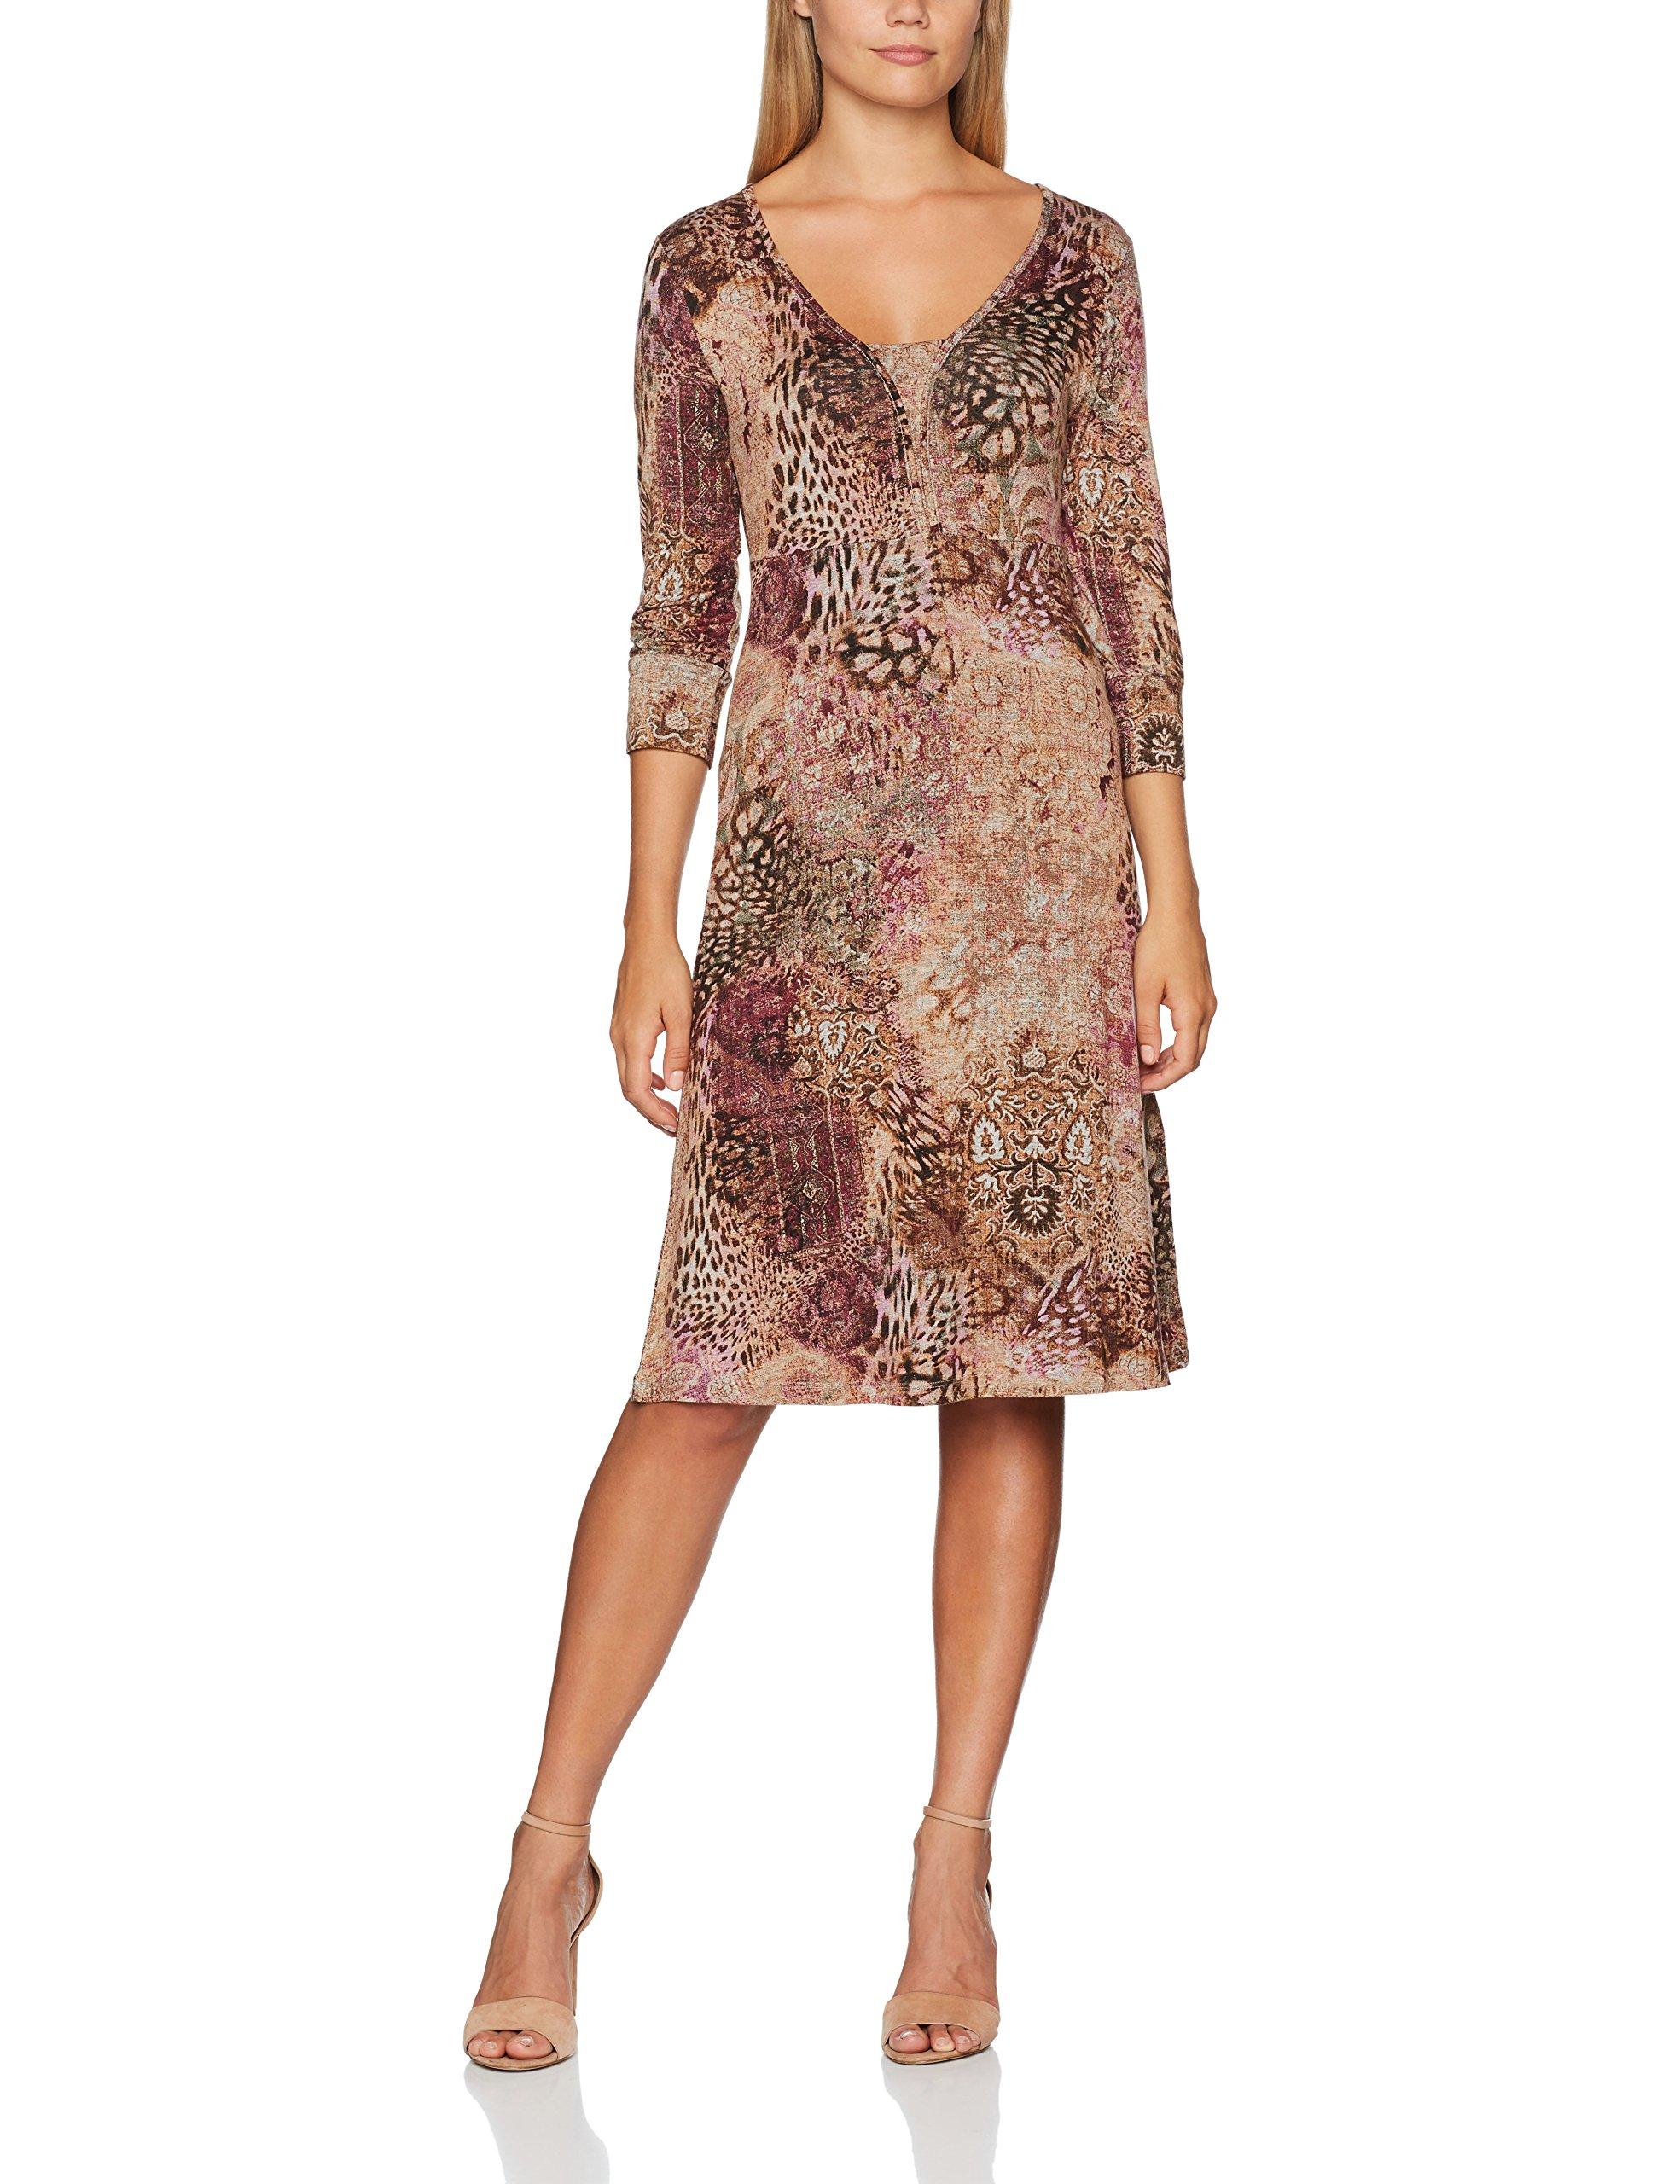 6094536taille Camel Dress Cream Candi FabricantXsFemme RobeEcrucafe NwynOm8v0